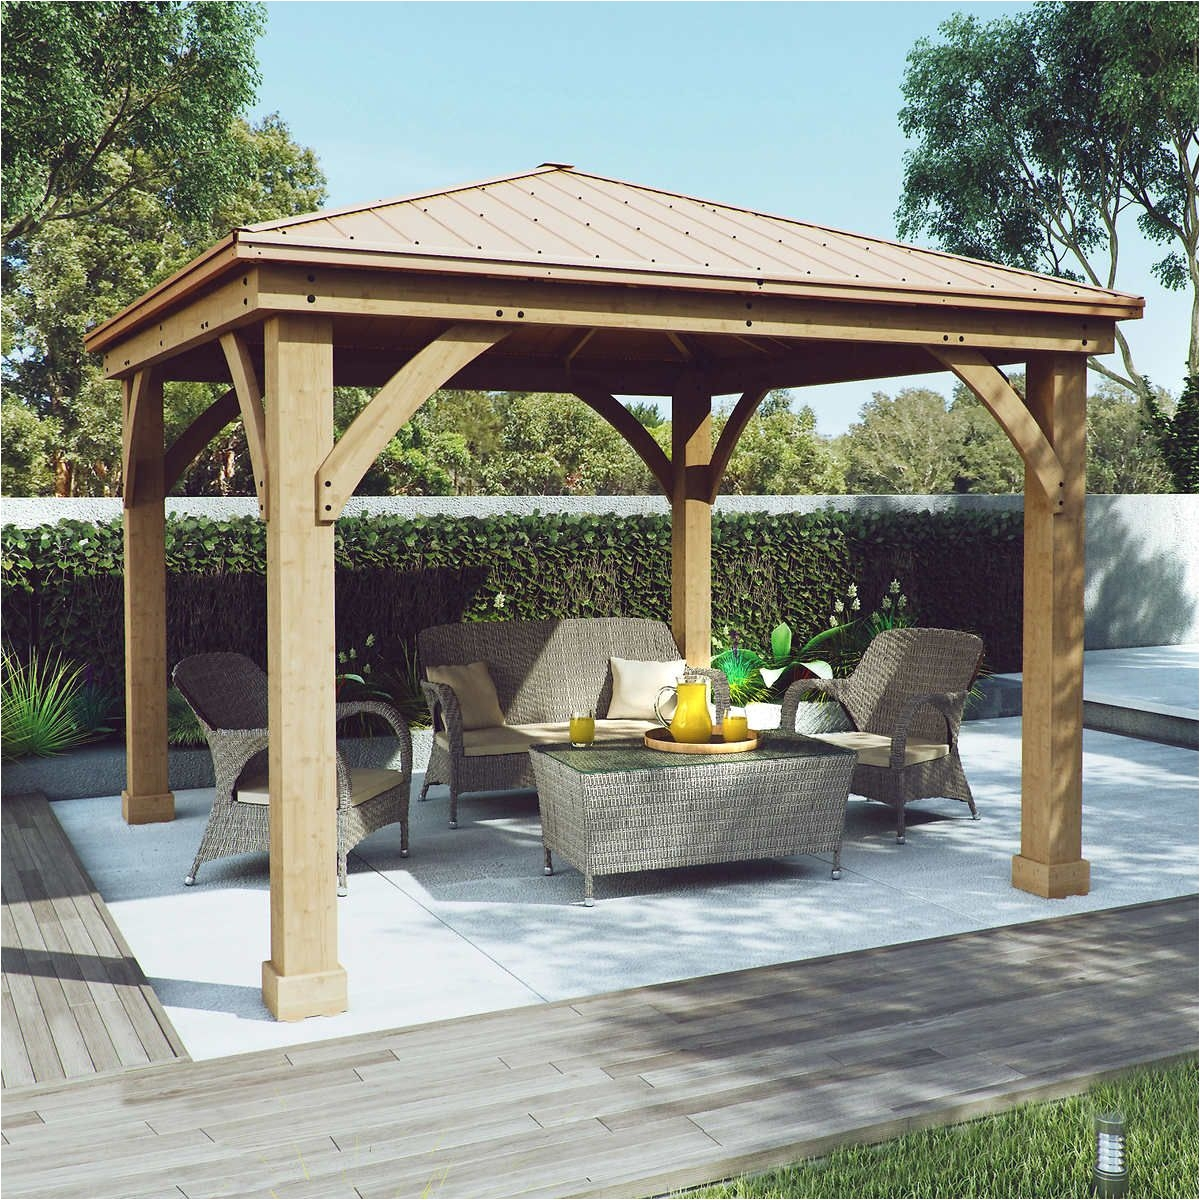 cedar wood 12 x 12 gazebo with aluminum roof by yardistry